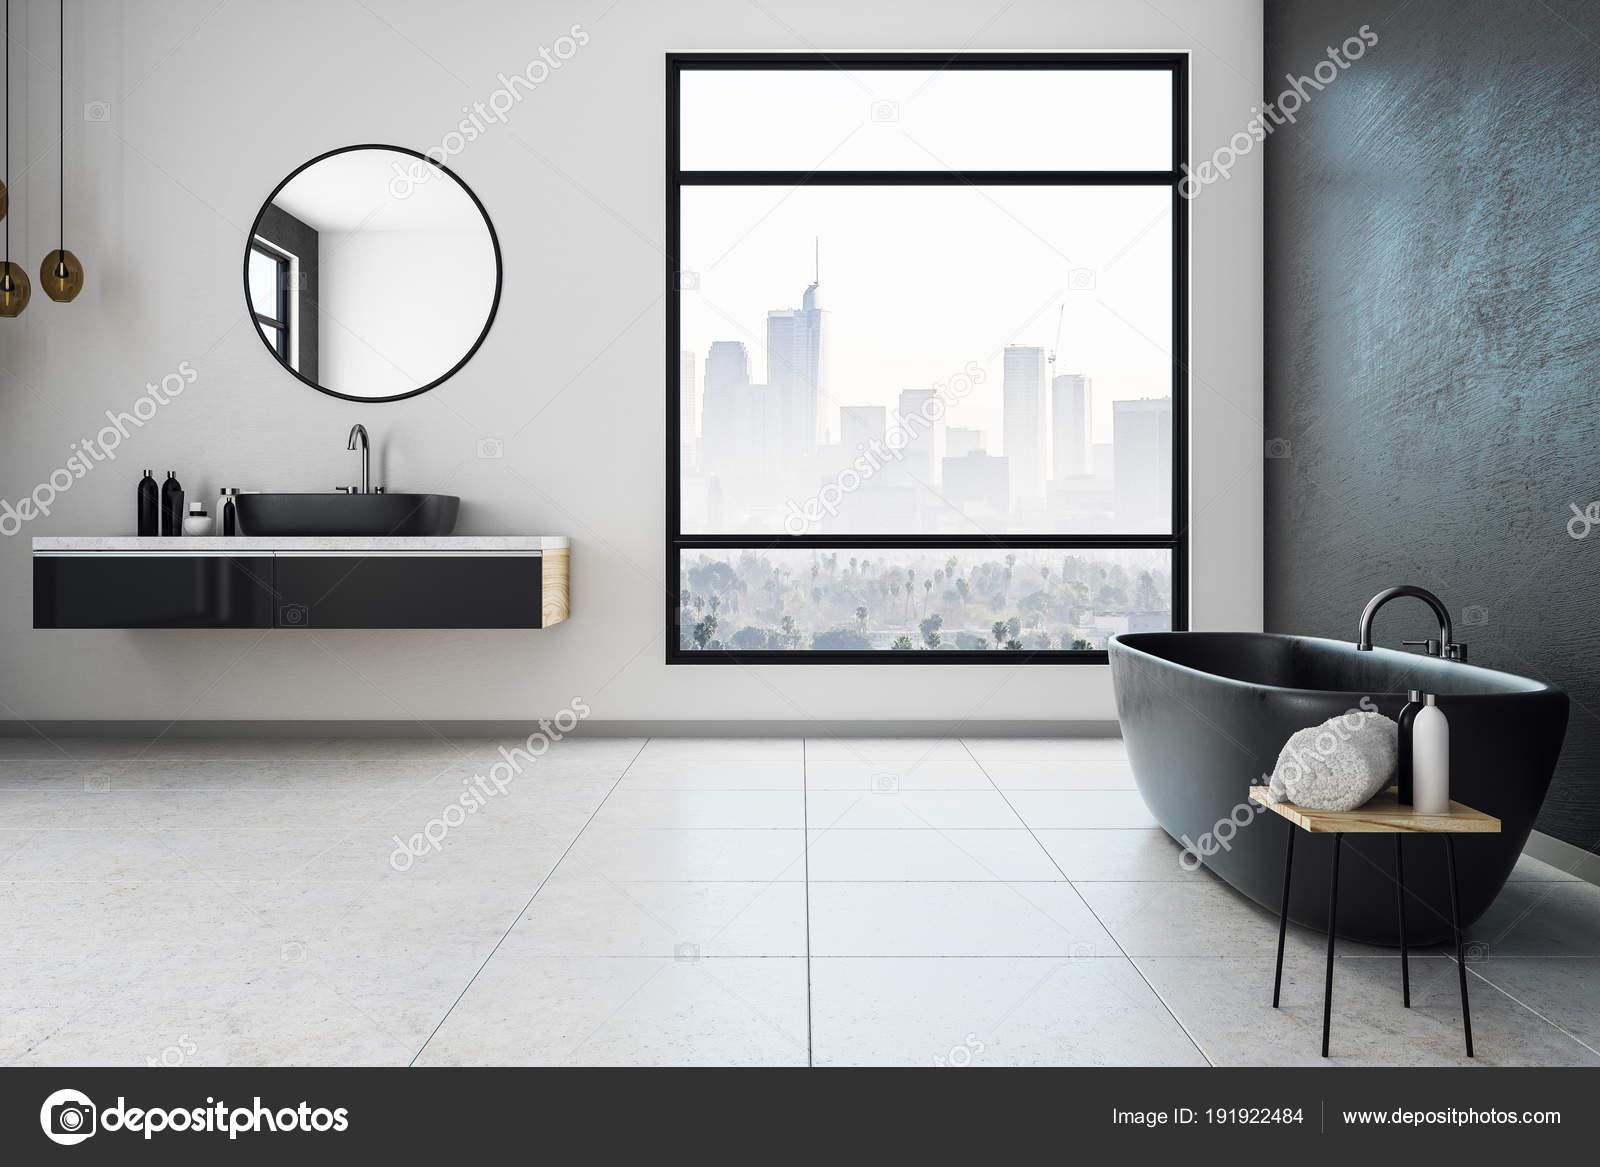 Modern Badkamer Interieur : Moderne badkamer interieur u stockfoto peshkova